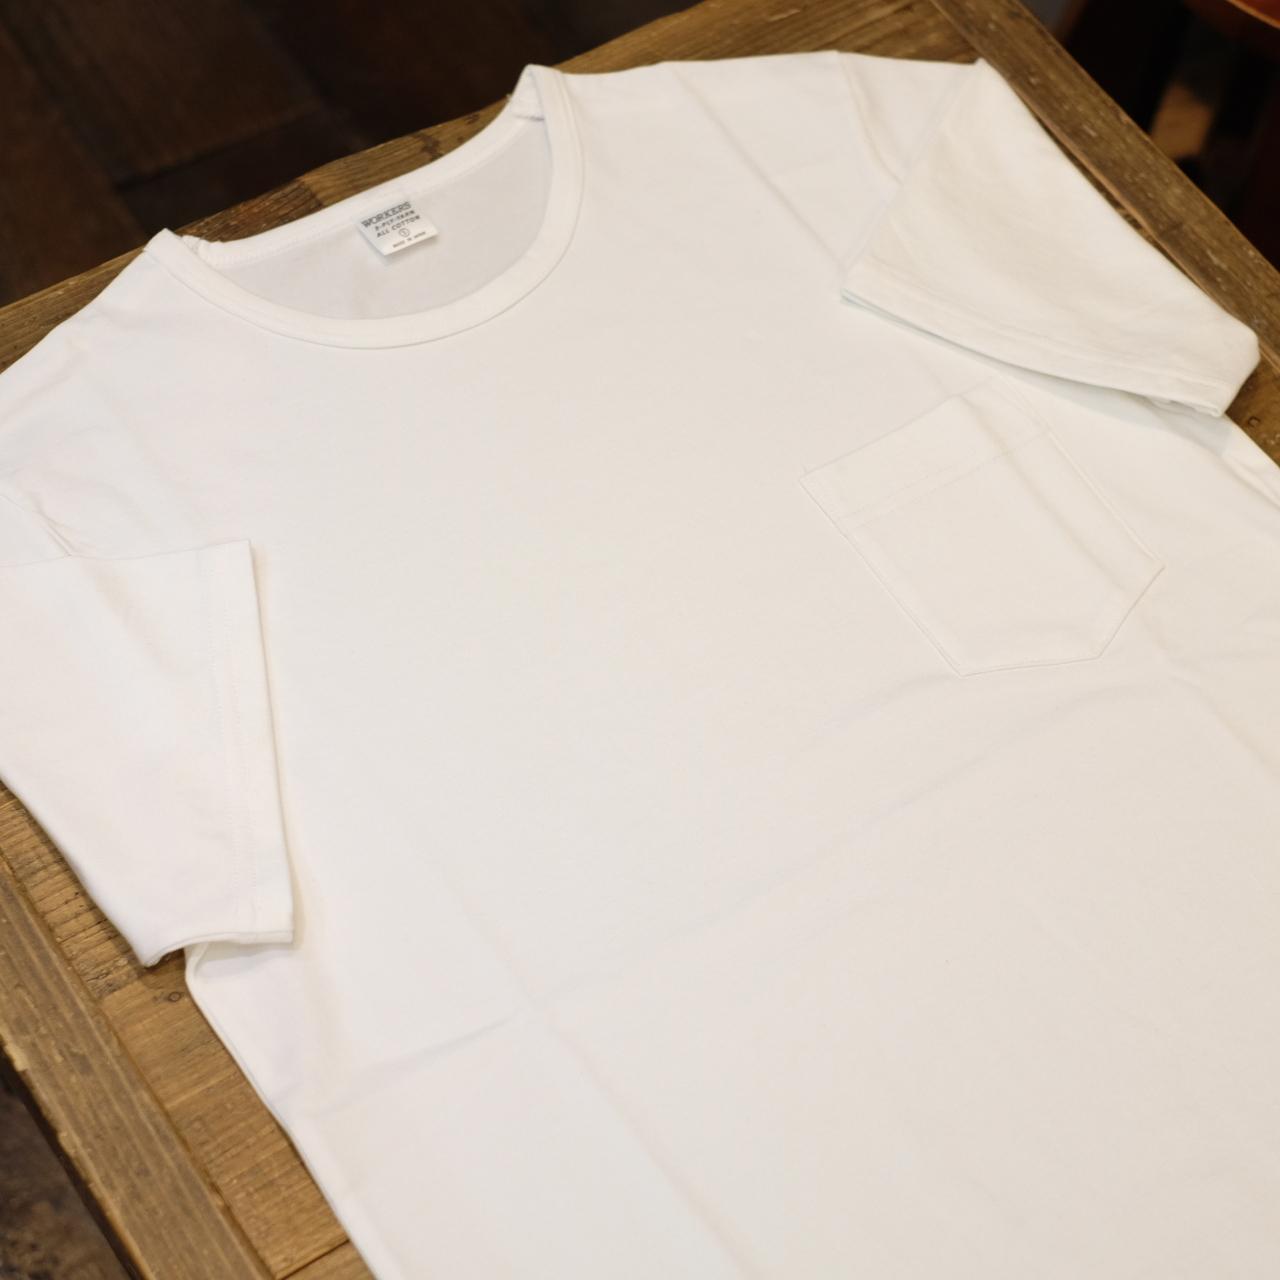 Workers(ワーカーズ) CIRCLE別注 3PLY ポケットTシャツ ホワイト